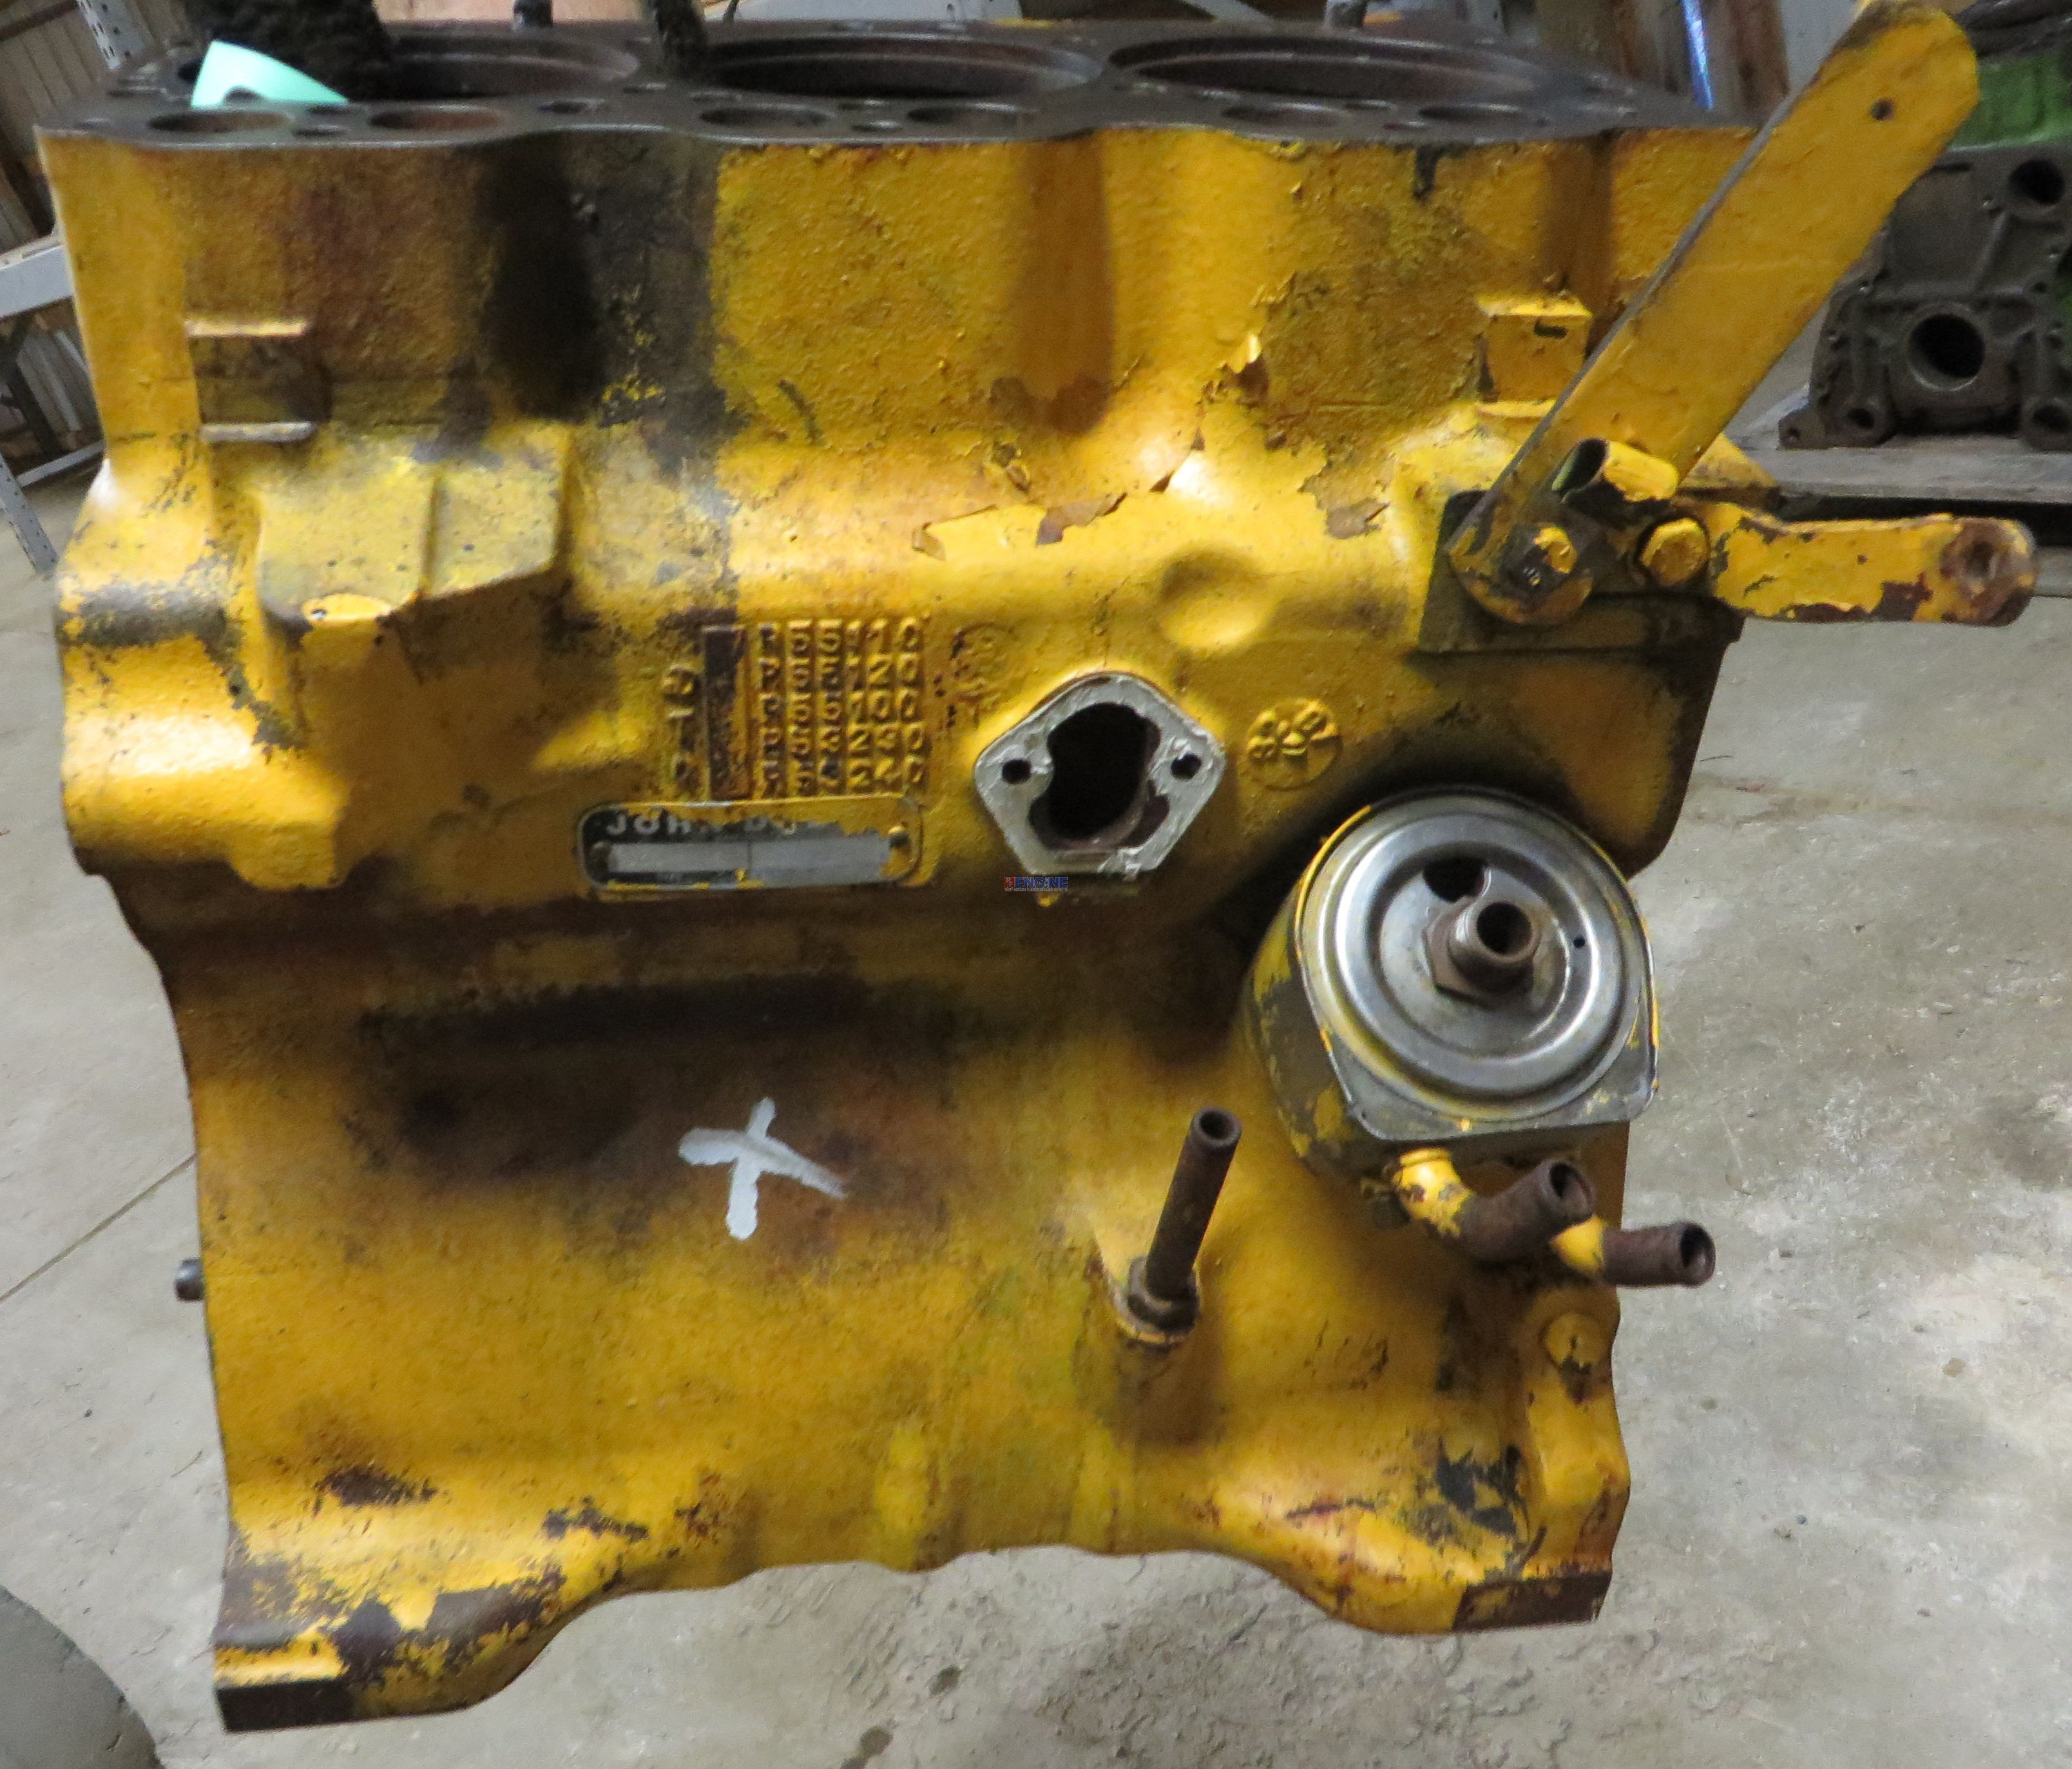 John Deere 1020 Engine : John deere jd engine block good used r cyl